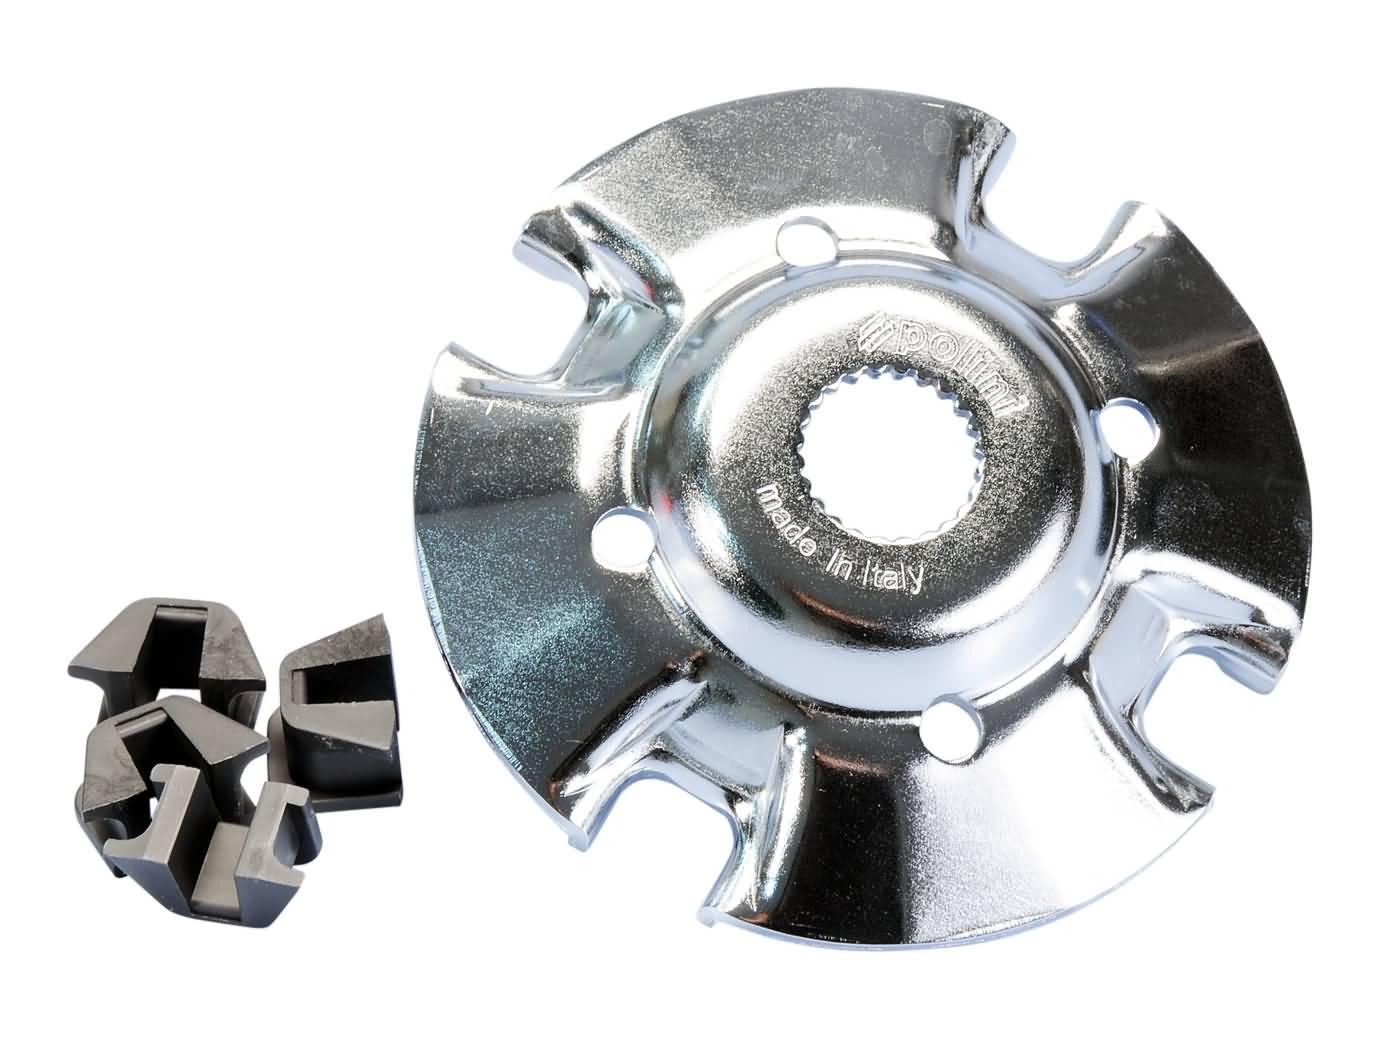 Piaggio NRG 50 Power DD LC 05-06  8.3 gram Variator Rollers